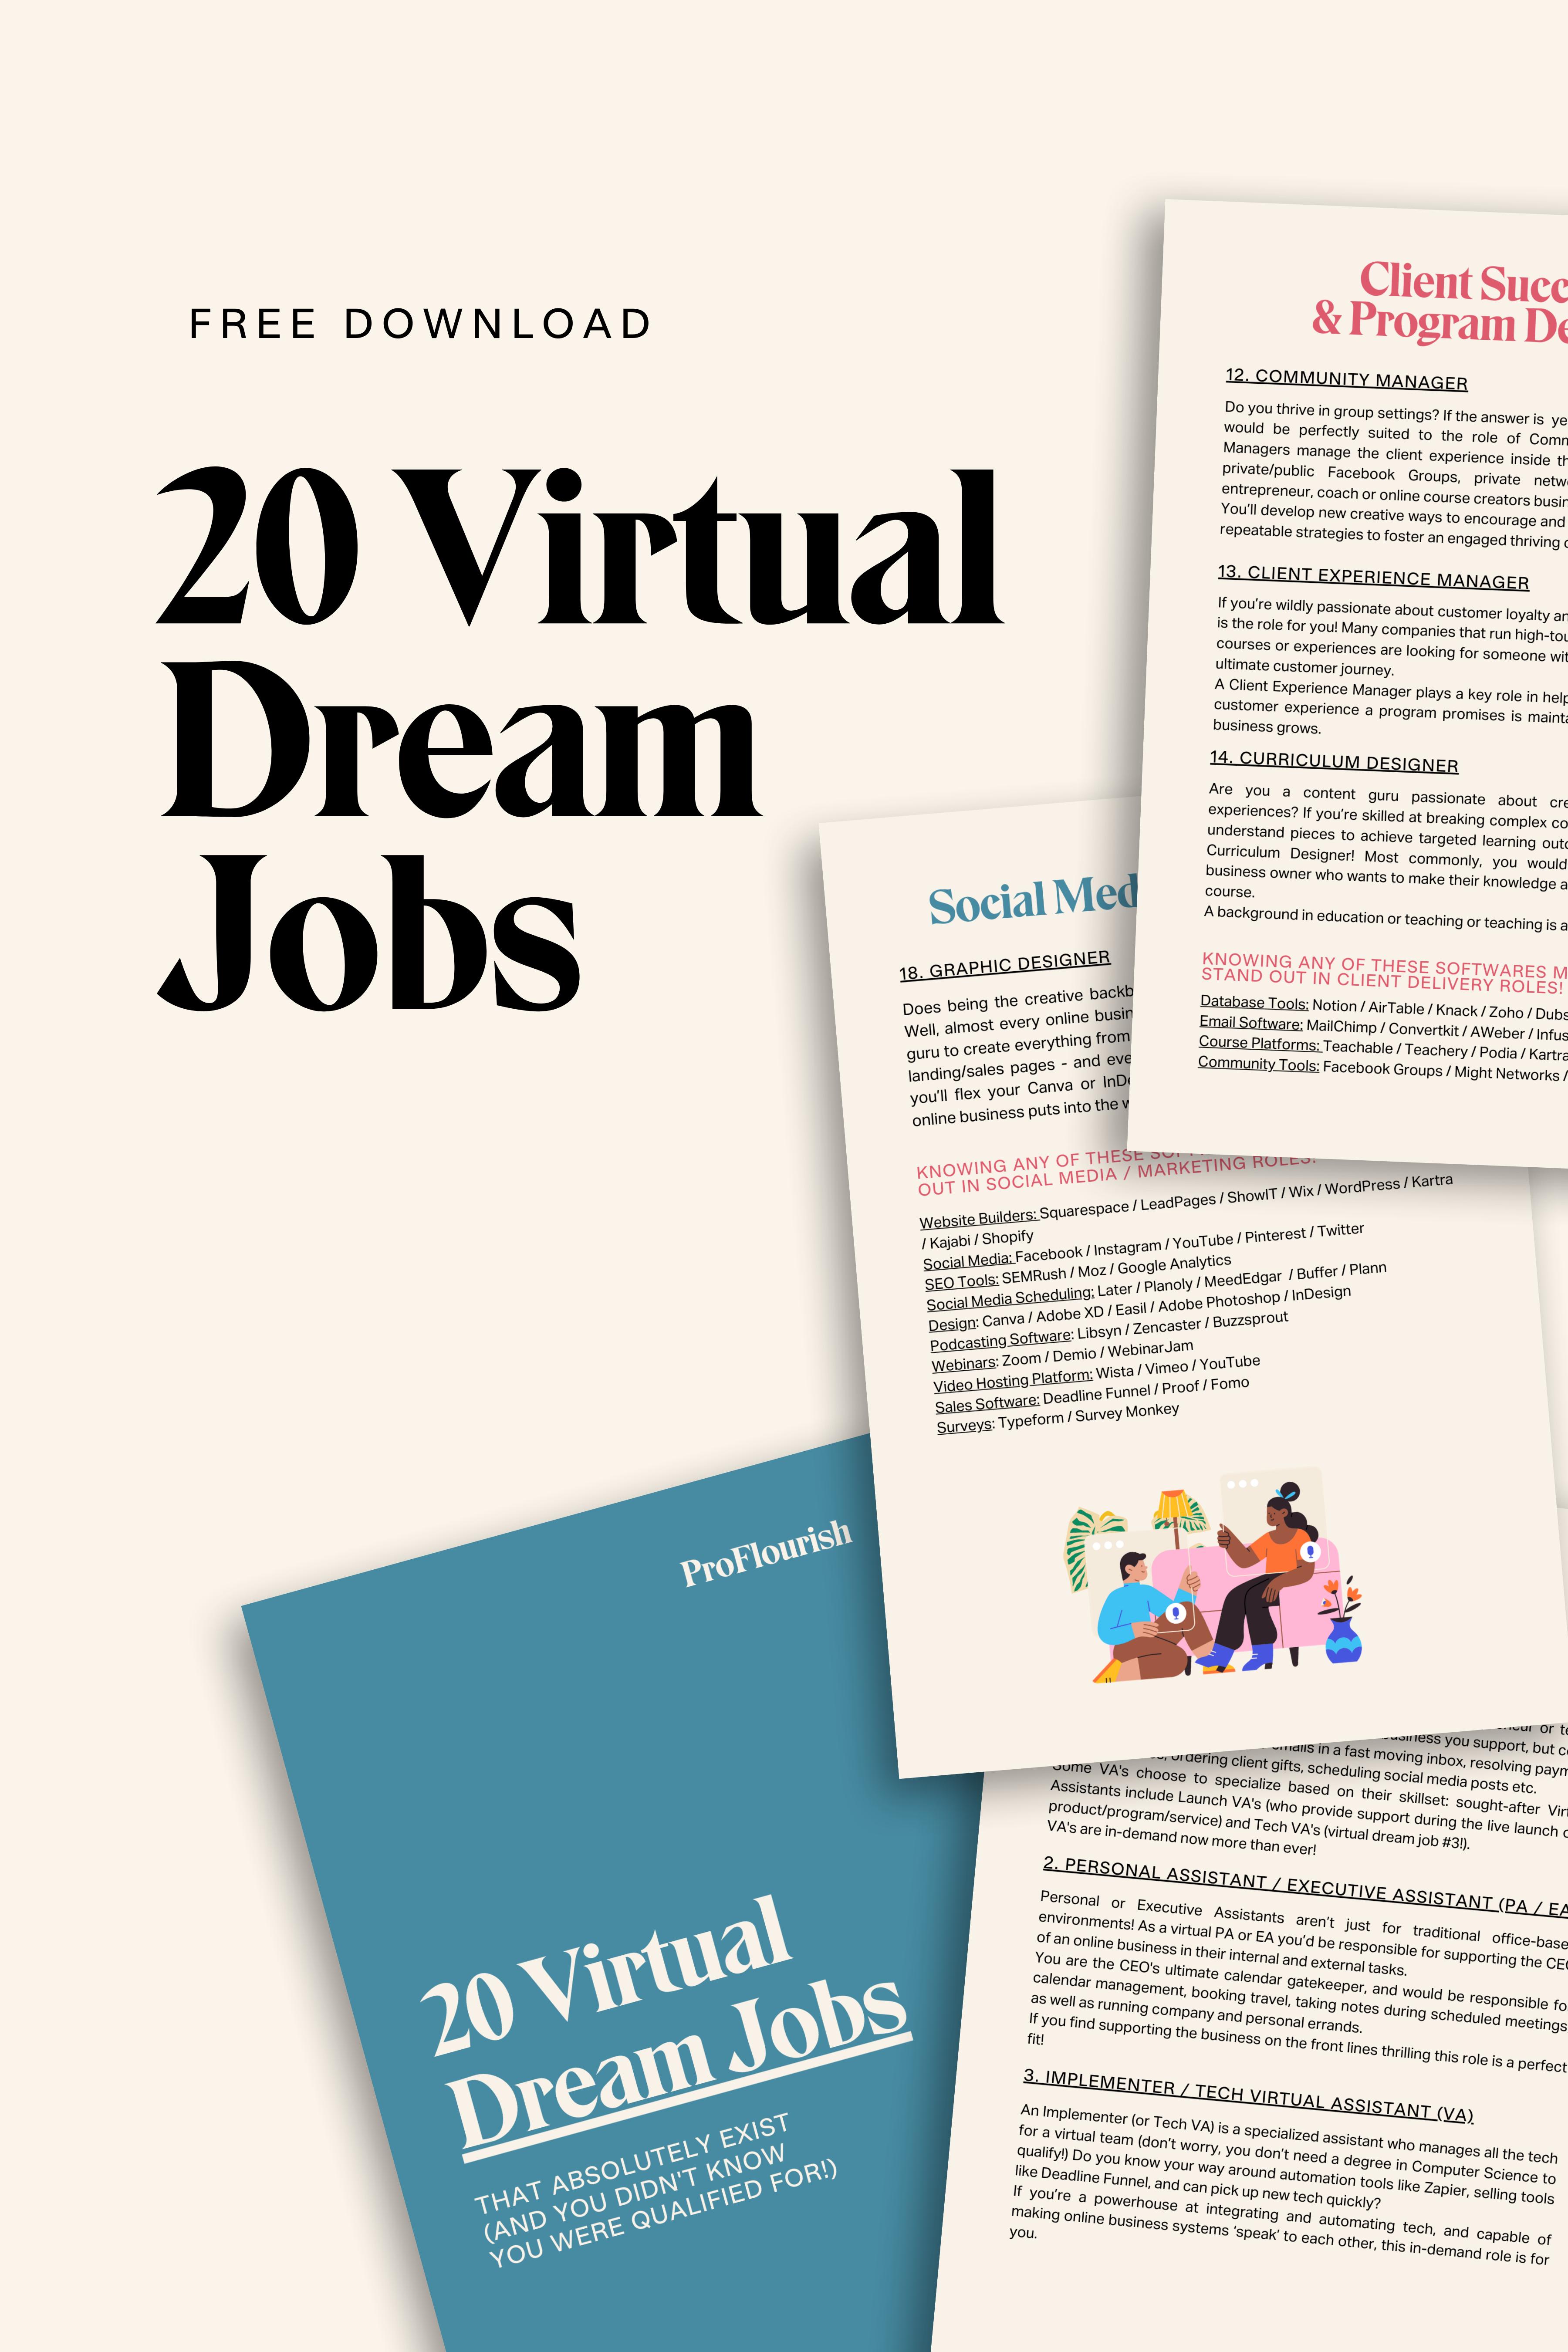 Find Your Virtual Dream Job A List Job Virtual Jobs Dream Job